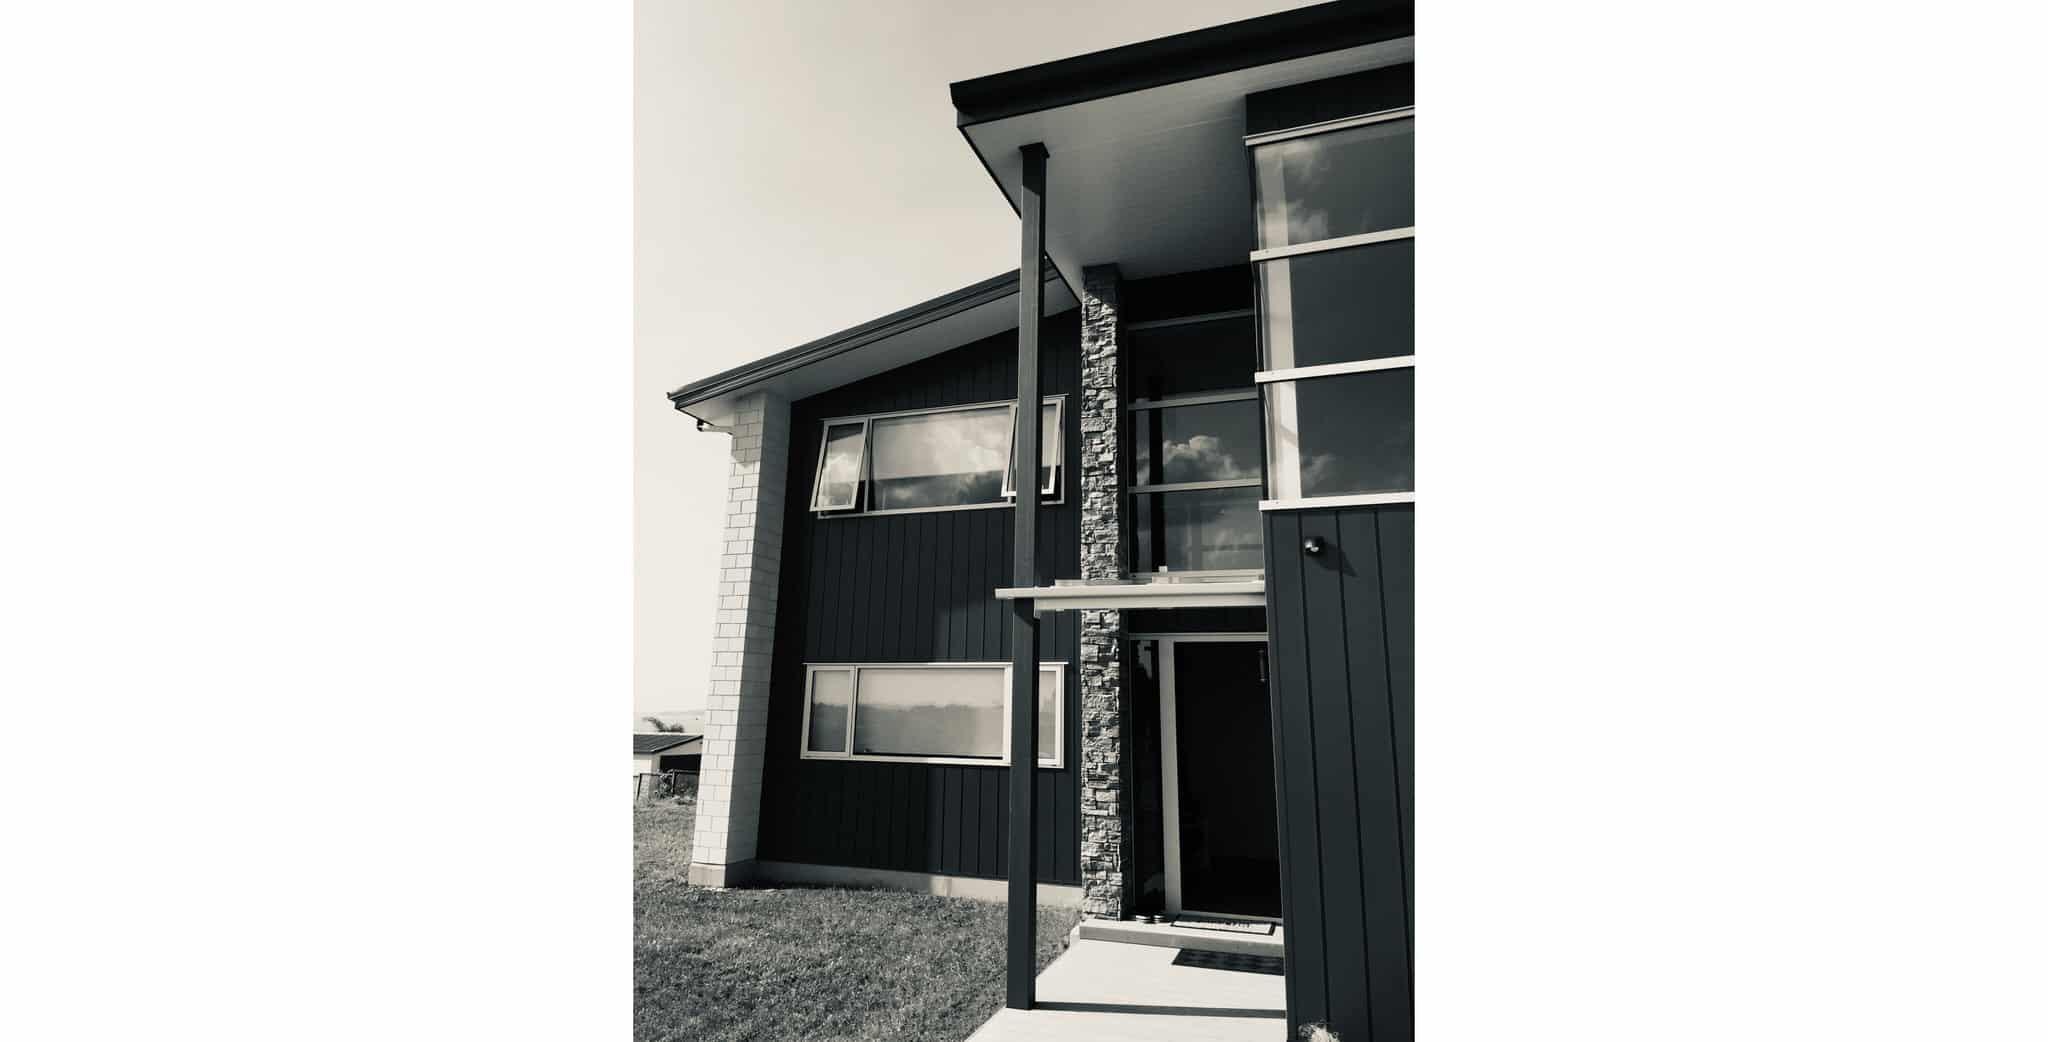 Maraetai House - Exterior b&w 1